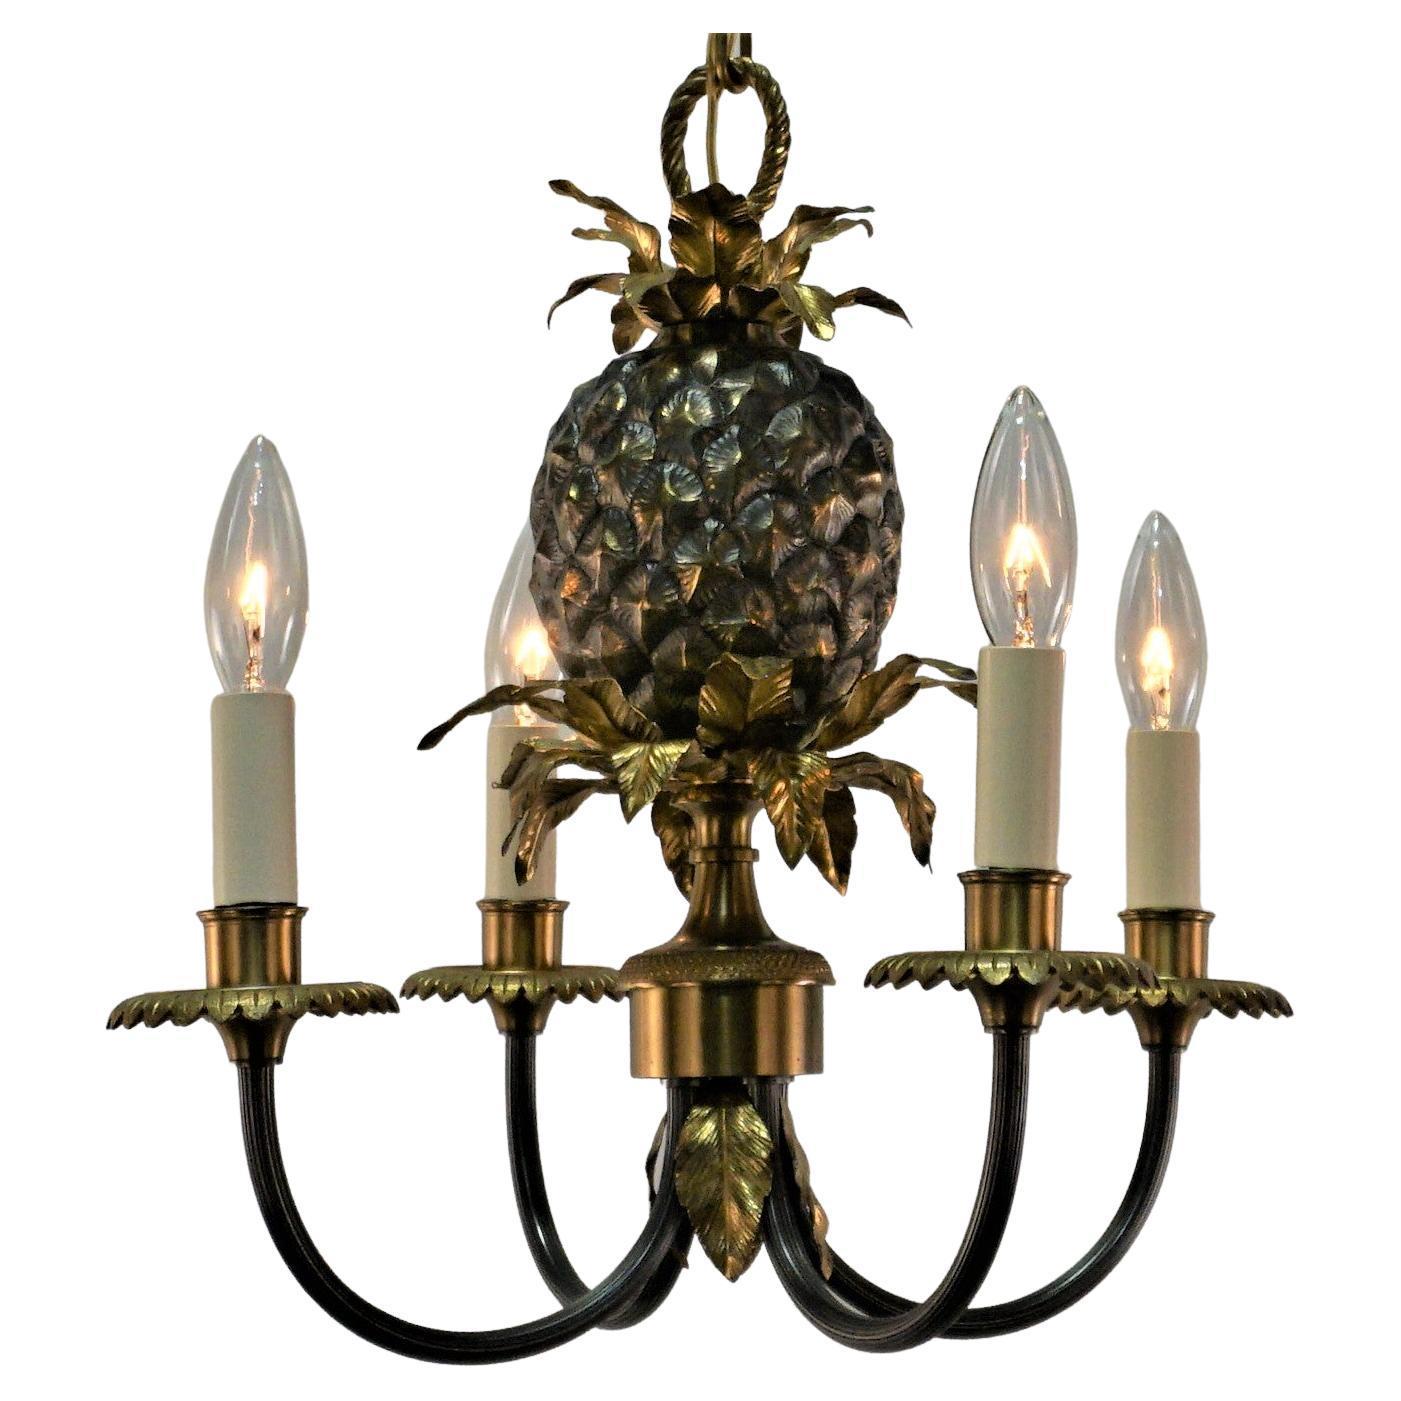 Maison Charles's Pineapple Bronze Chandelier